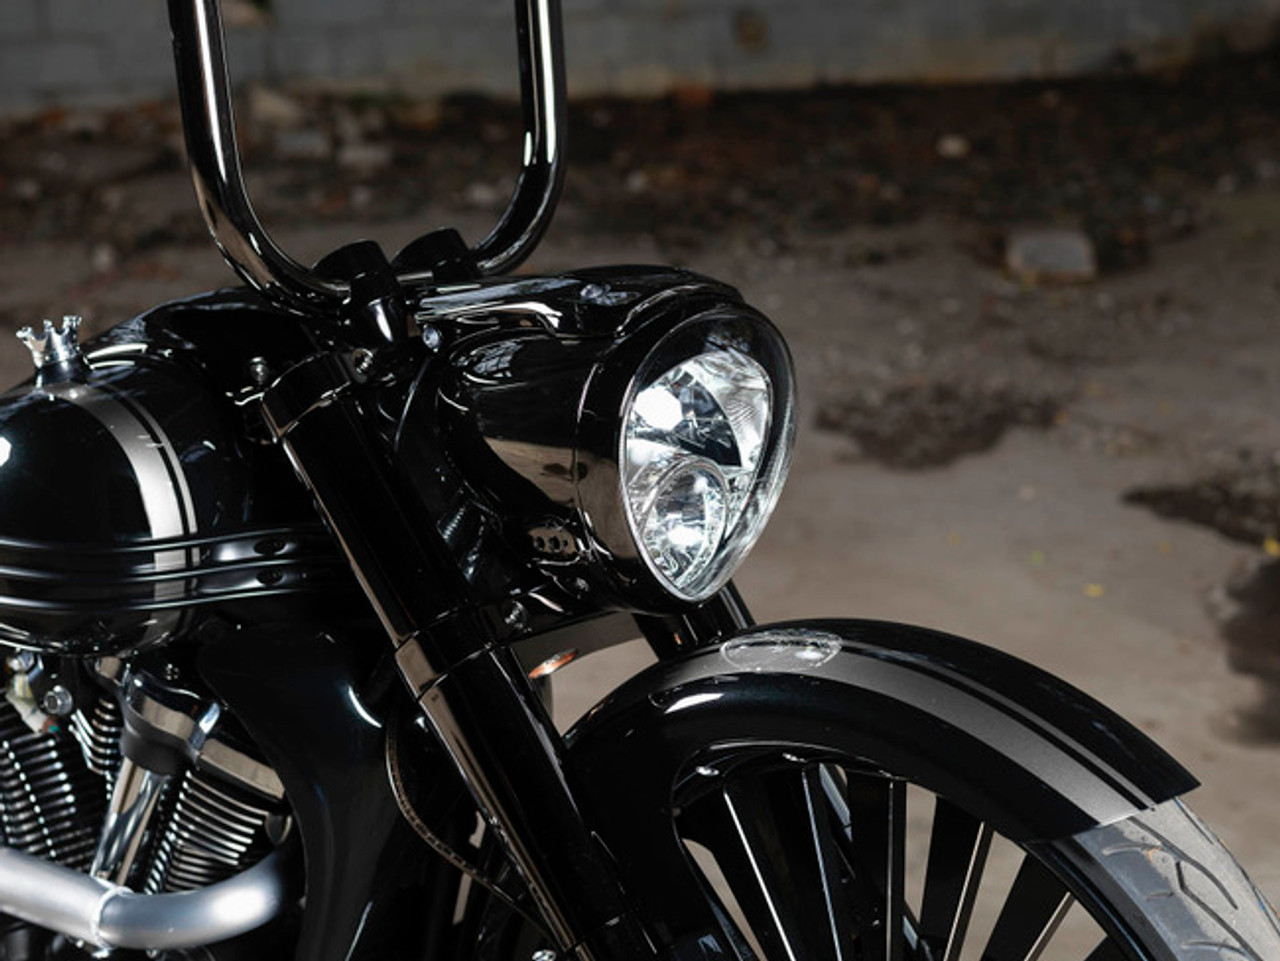 Blacksmith Retroliner Le Mans C26 OEM headlight and Nacelle cover